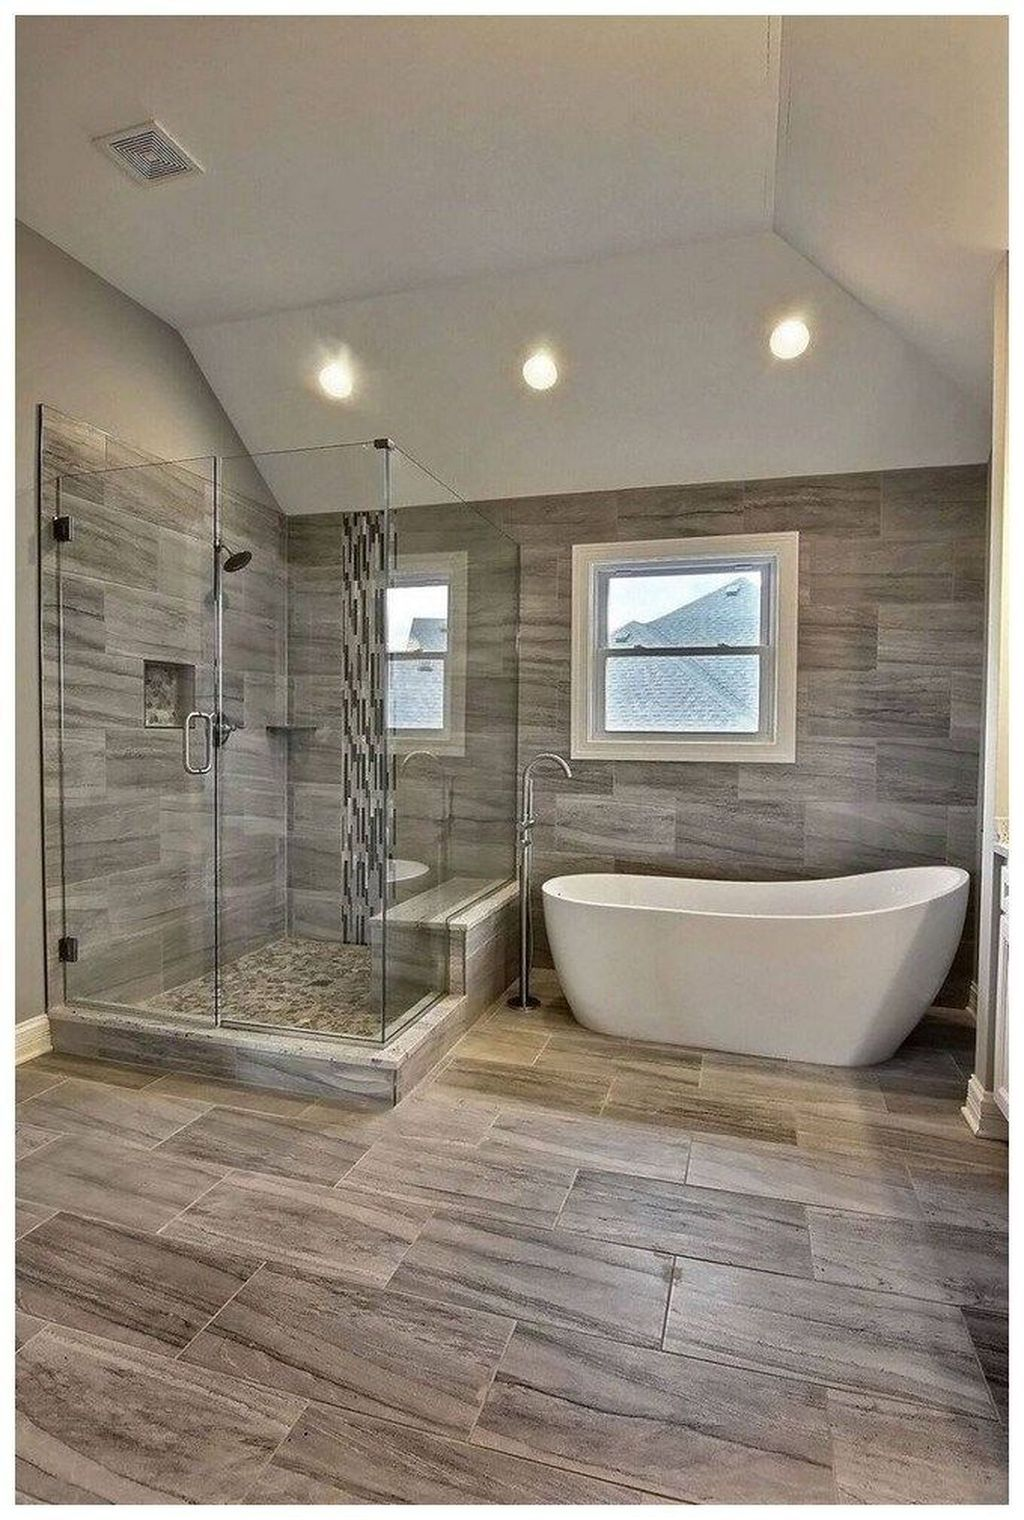 34 Fancy Master Bathroom Design Ideas For Amazing Home In 2020 Master Bathroom Design Restroom Remodel Bathroom Renovation Diy